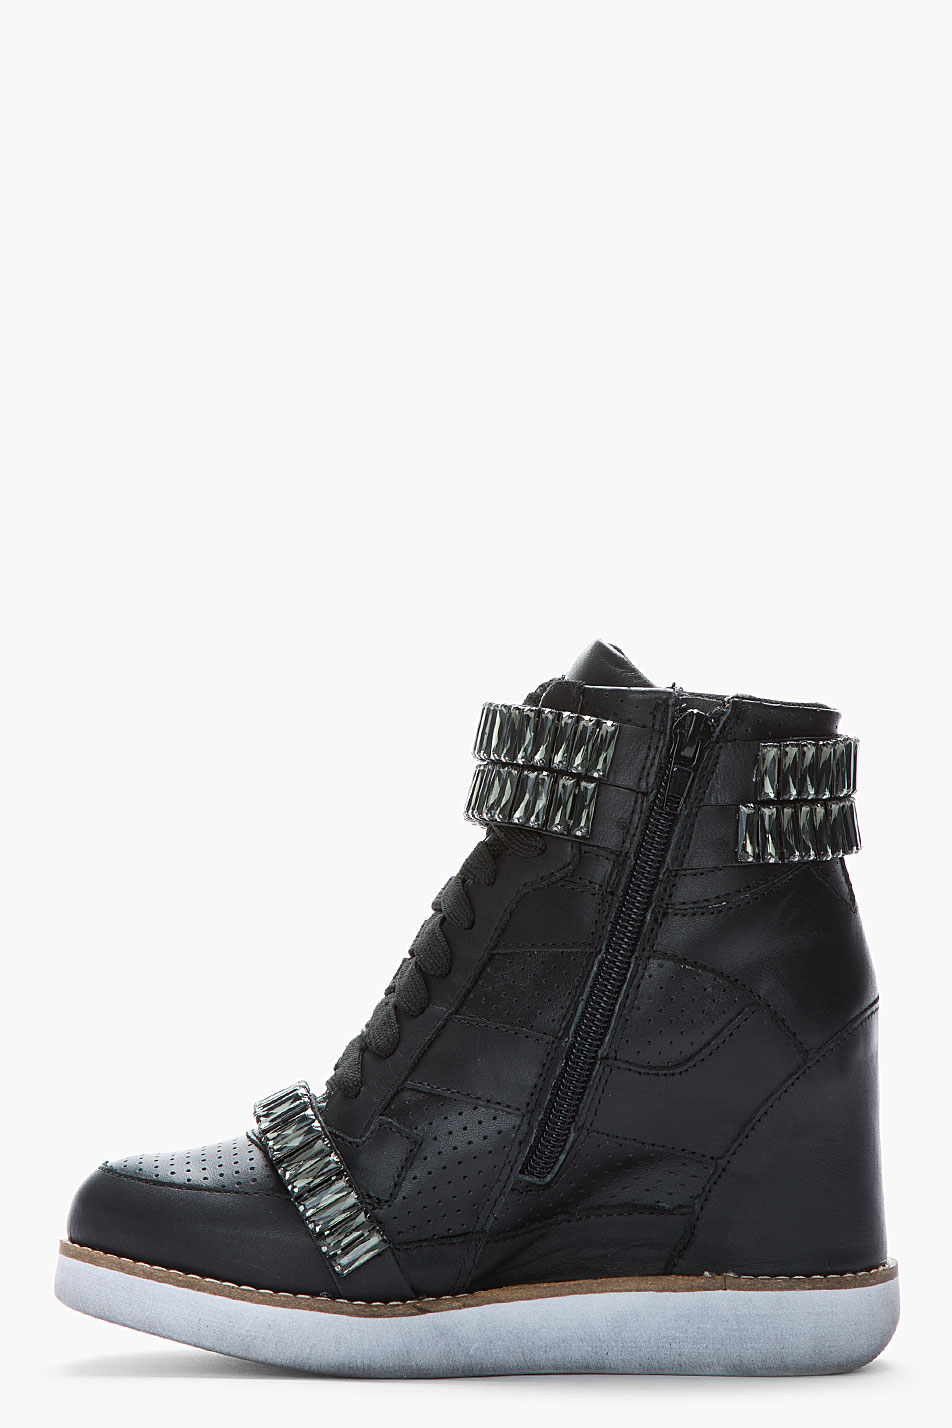 Lyst Jeffrey Campbell Black Leather Crystalaccented Bonn